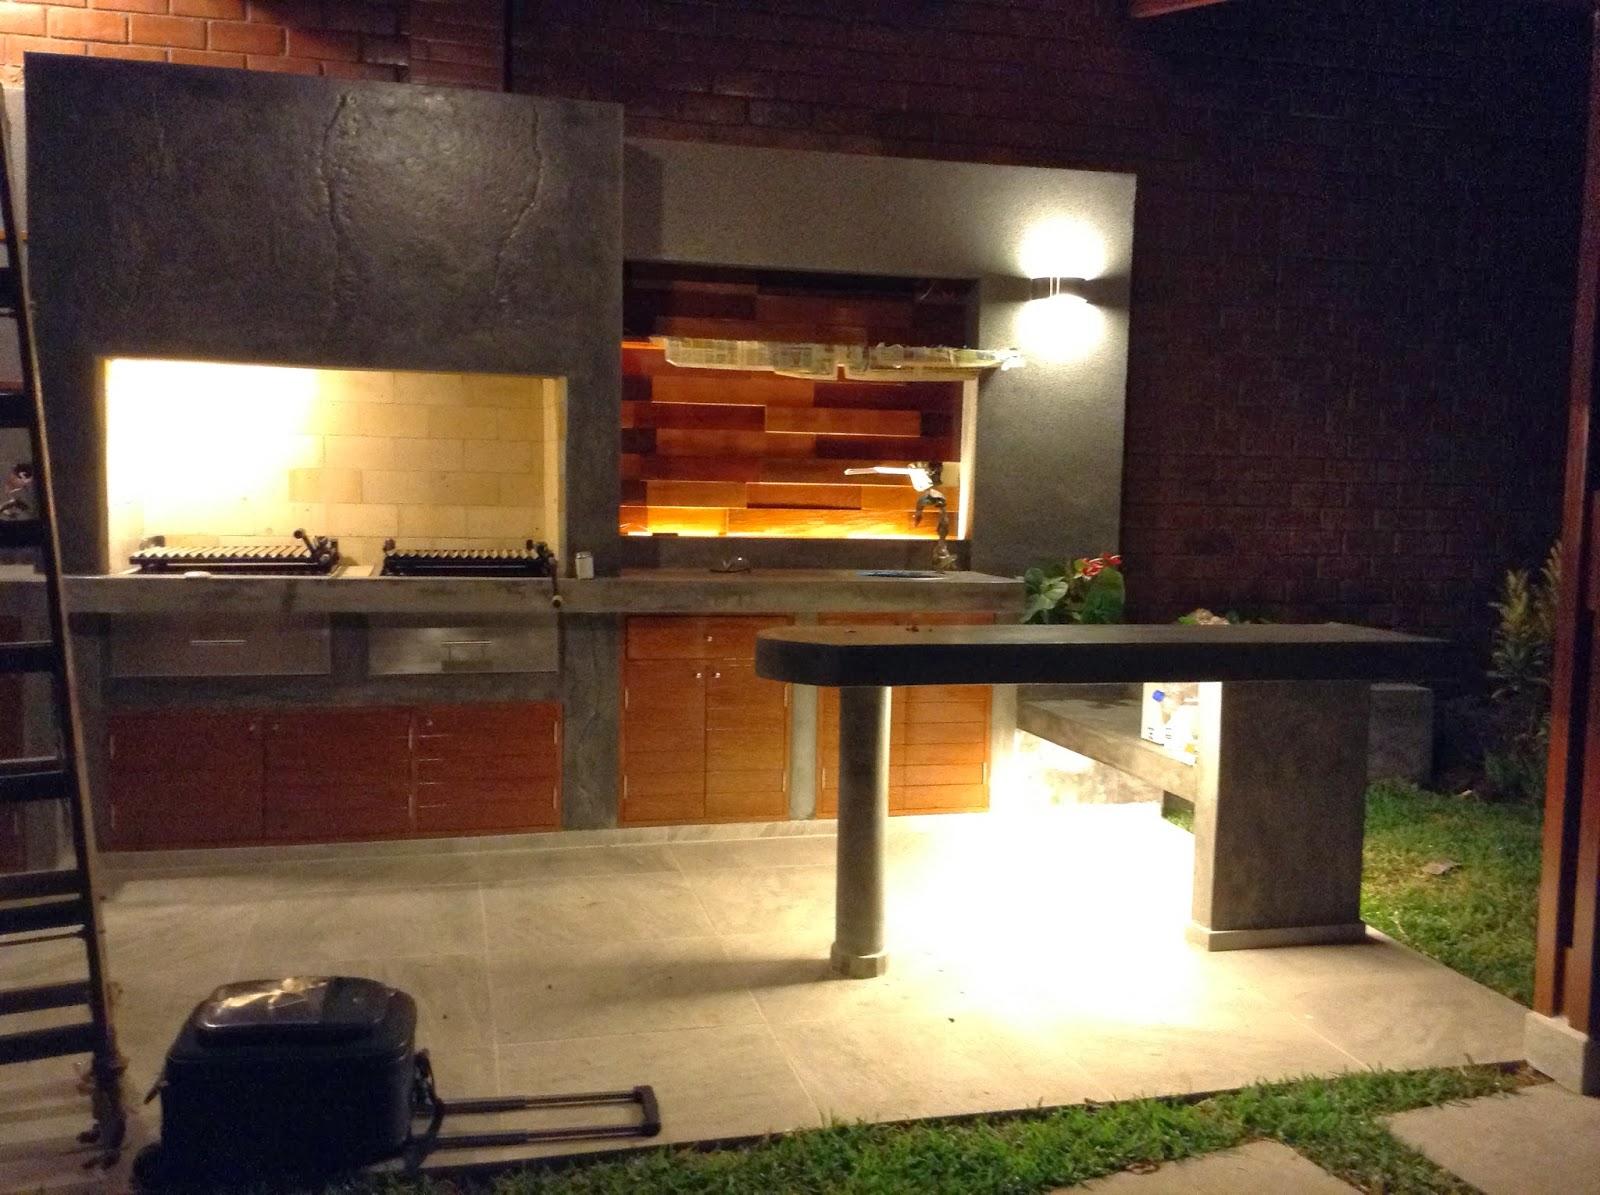 Oniria iluminaci n en parrilla de terraza for Parrilla para dentro de la casa